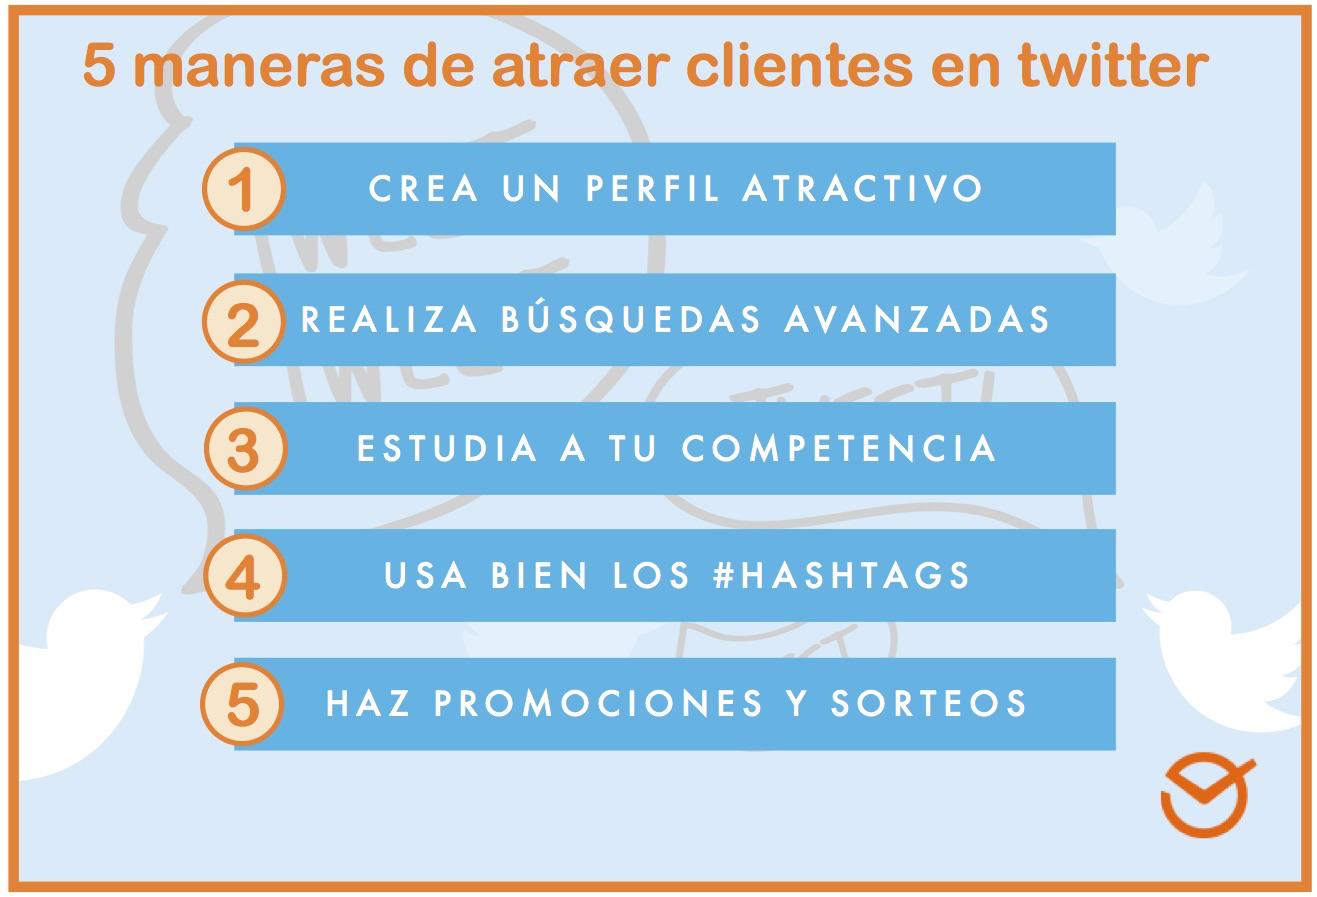 Atraer Clientes A Través De Twitter 5 Estrategias Infalibles